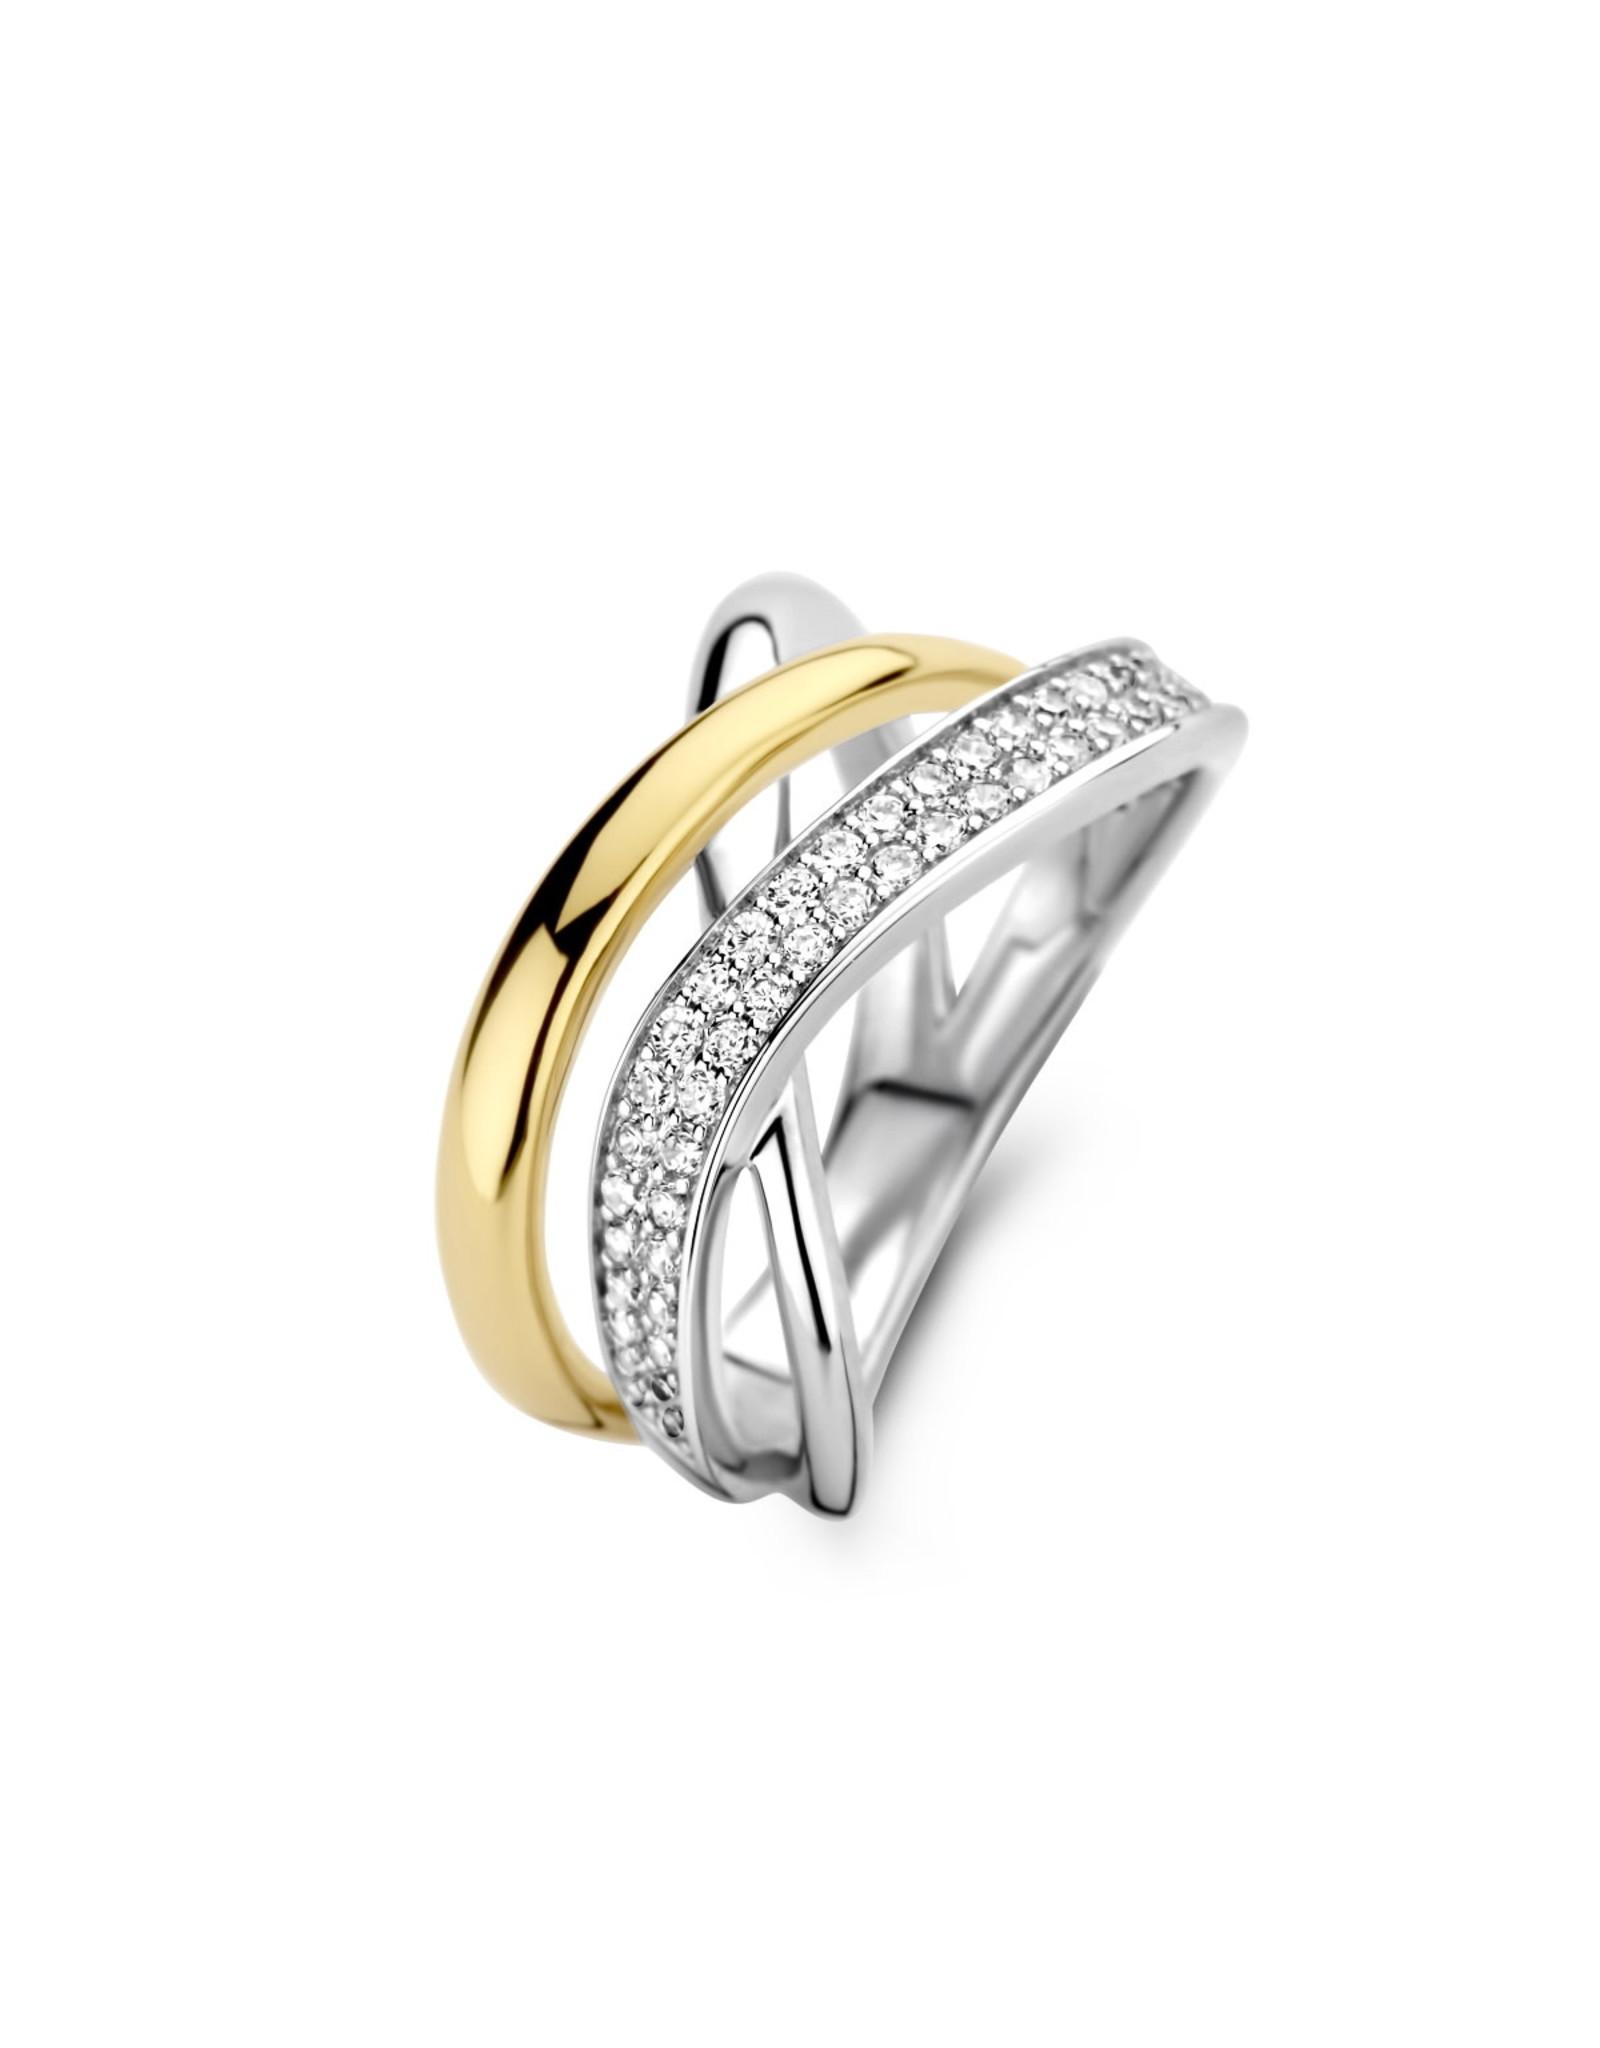 Ring Naiomy Silver N1C54 Bicolor Zilver Verguld